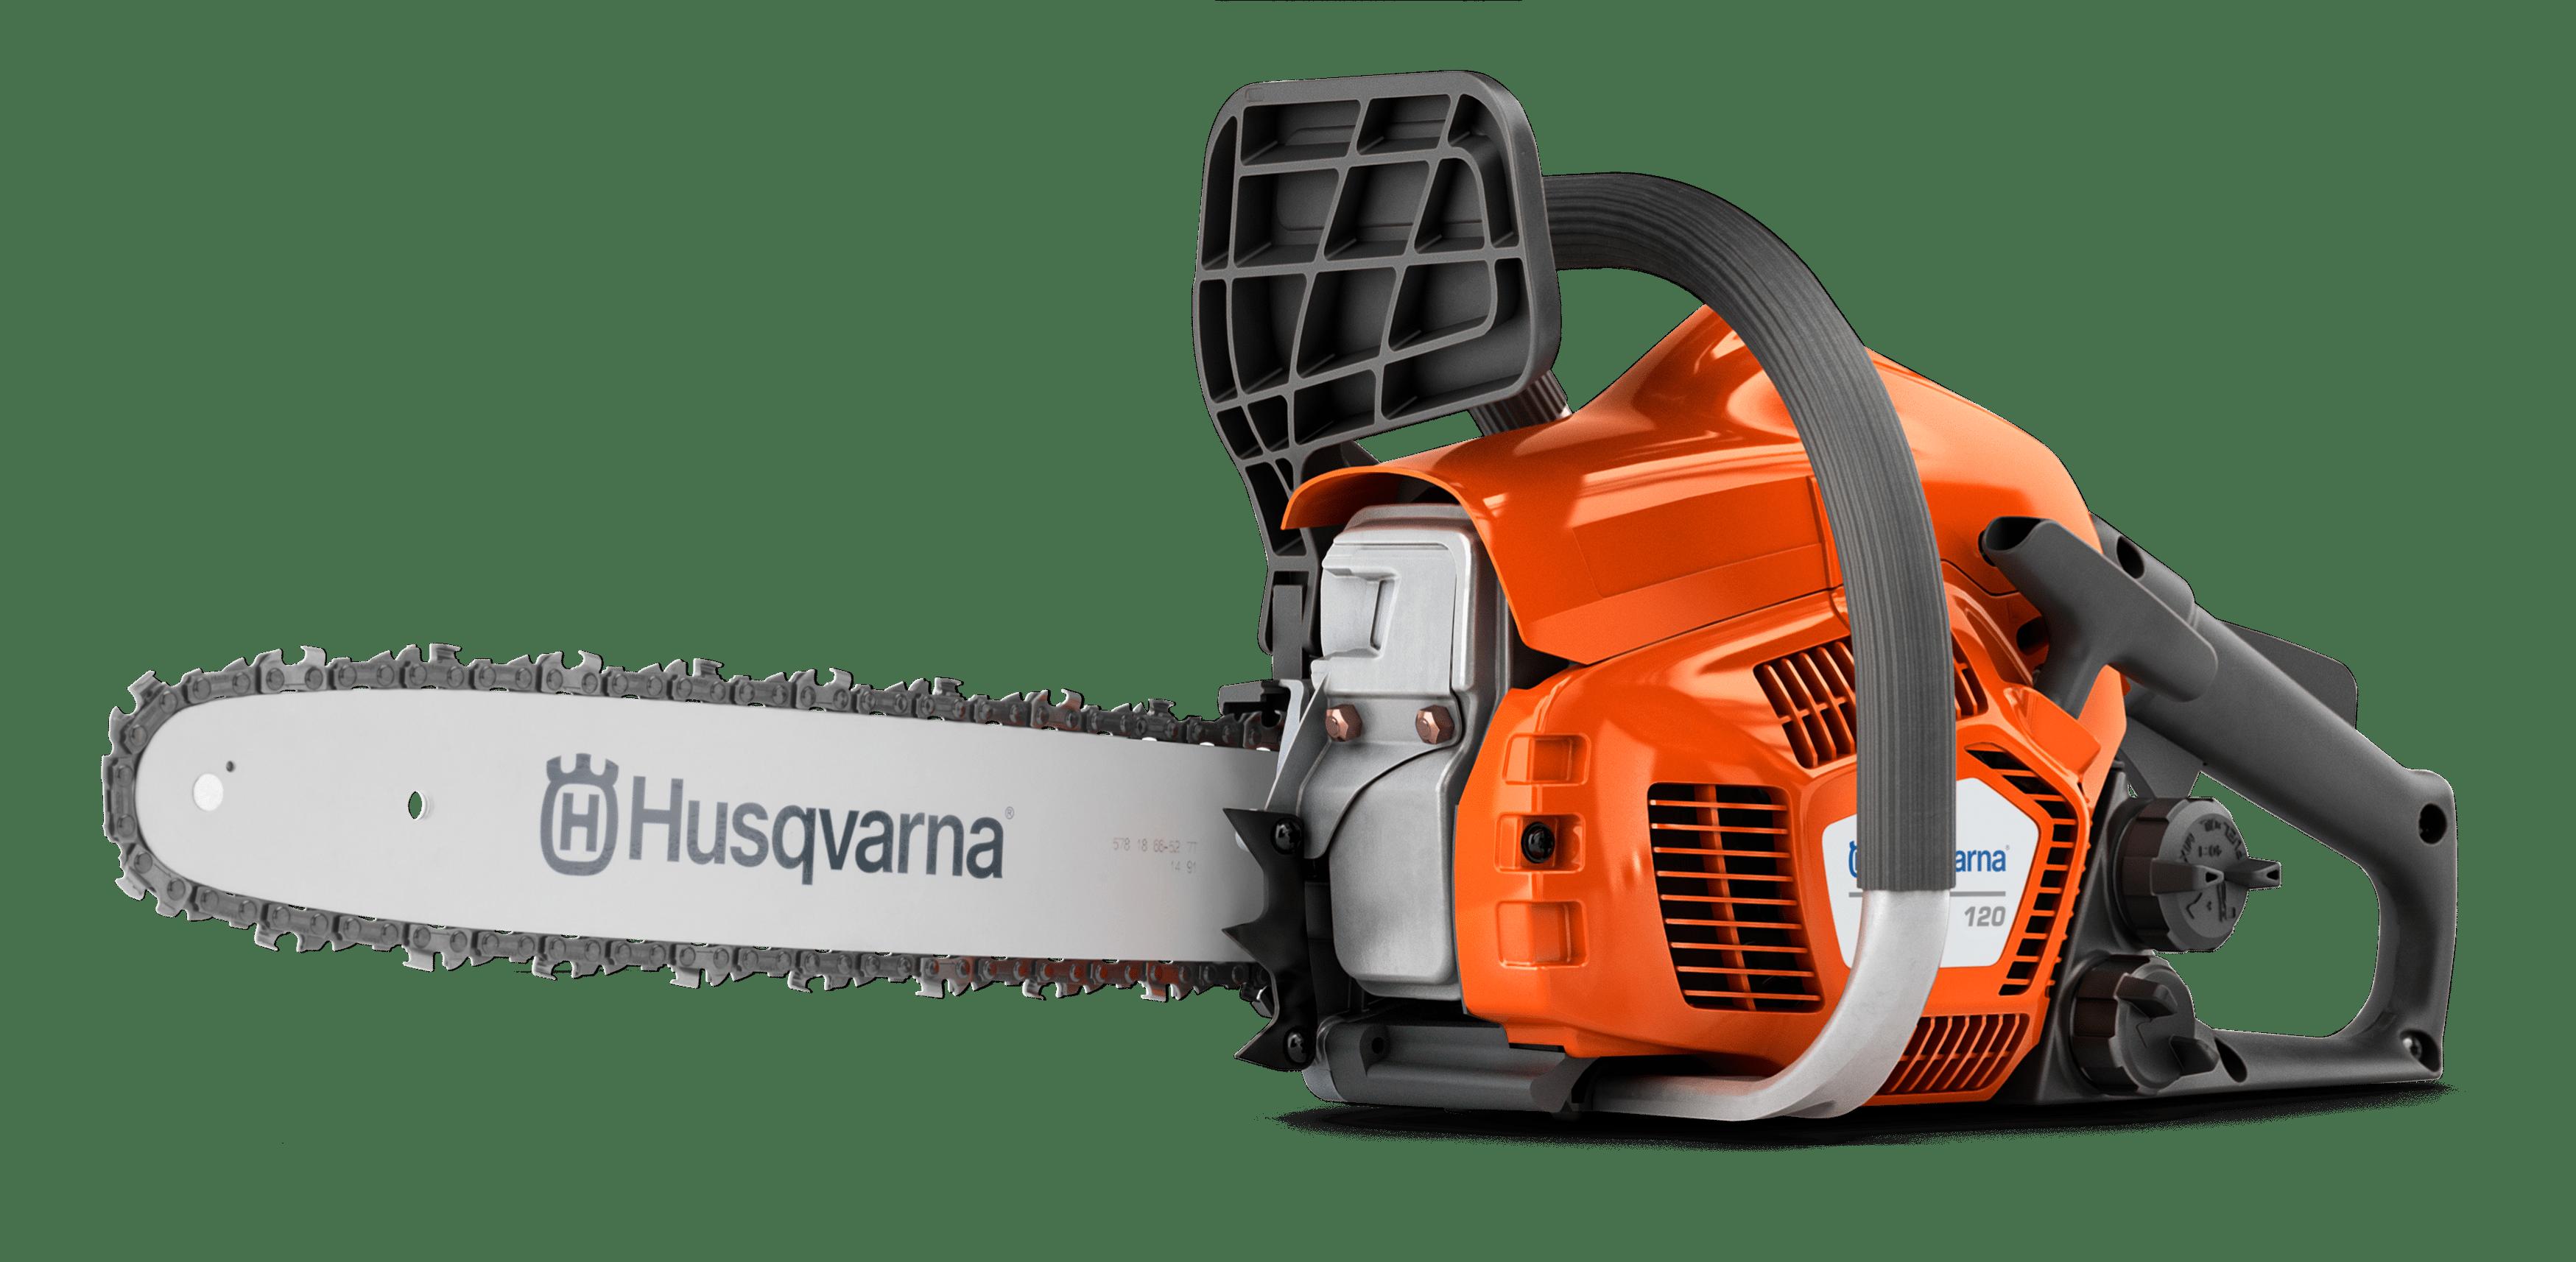 Husqvarna Chainsaws 120